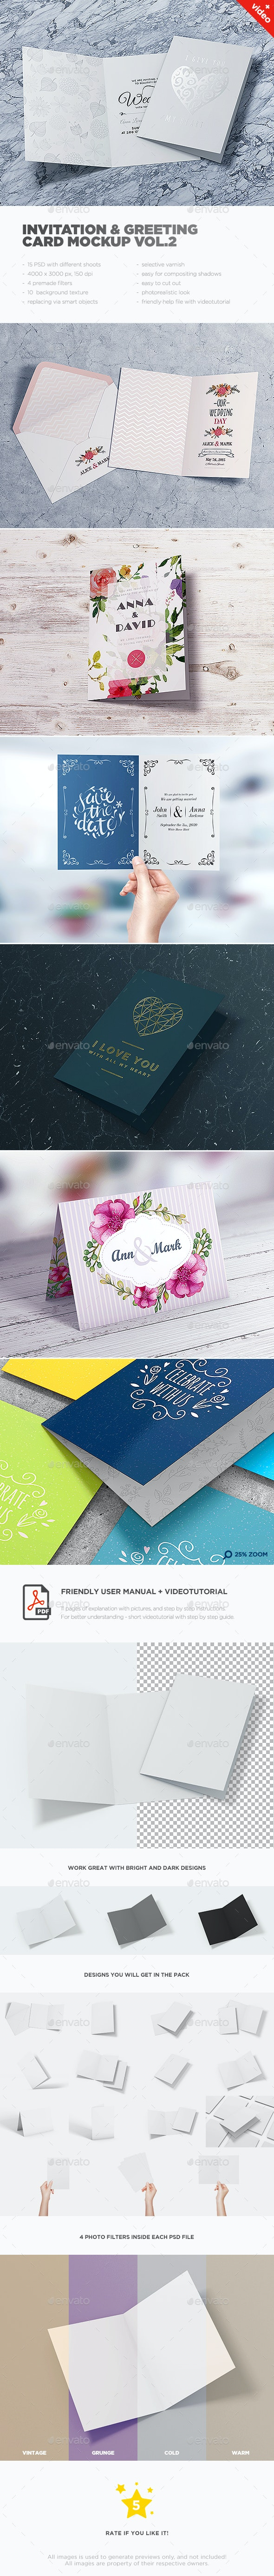 Invitation & Greeting Card MockUp vol.2 - Miscellaneous Print